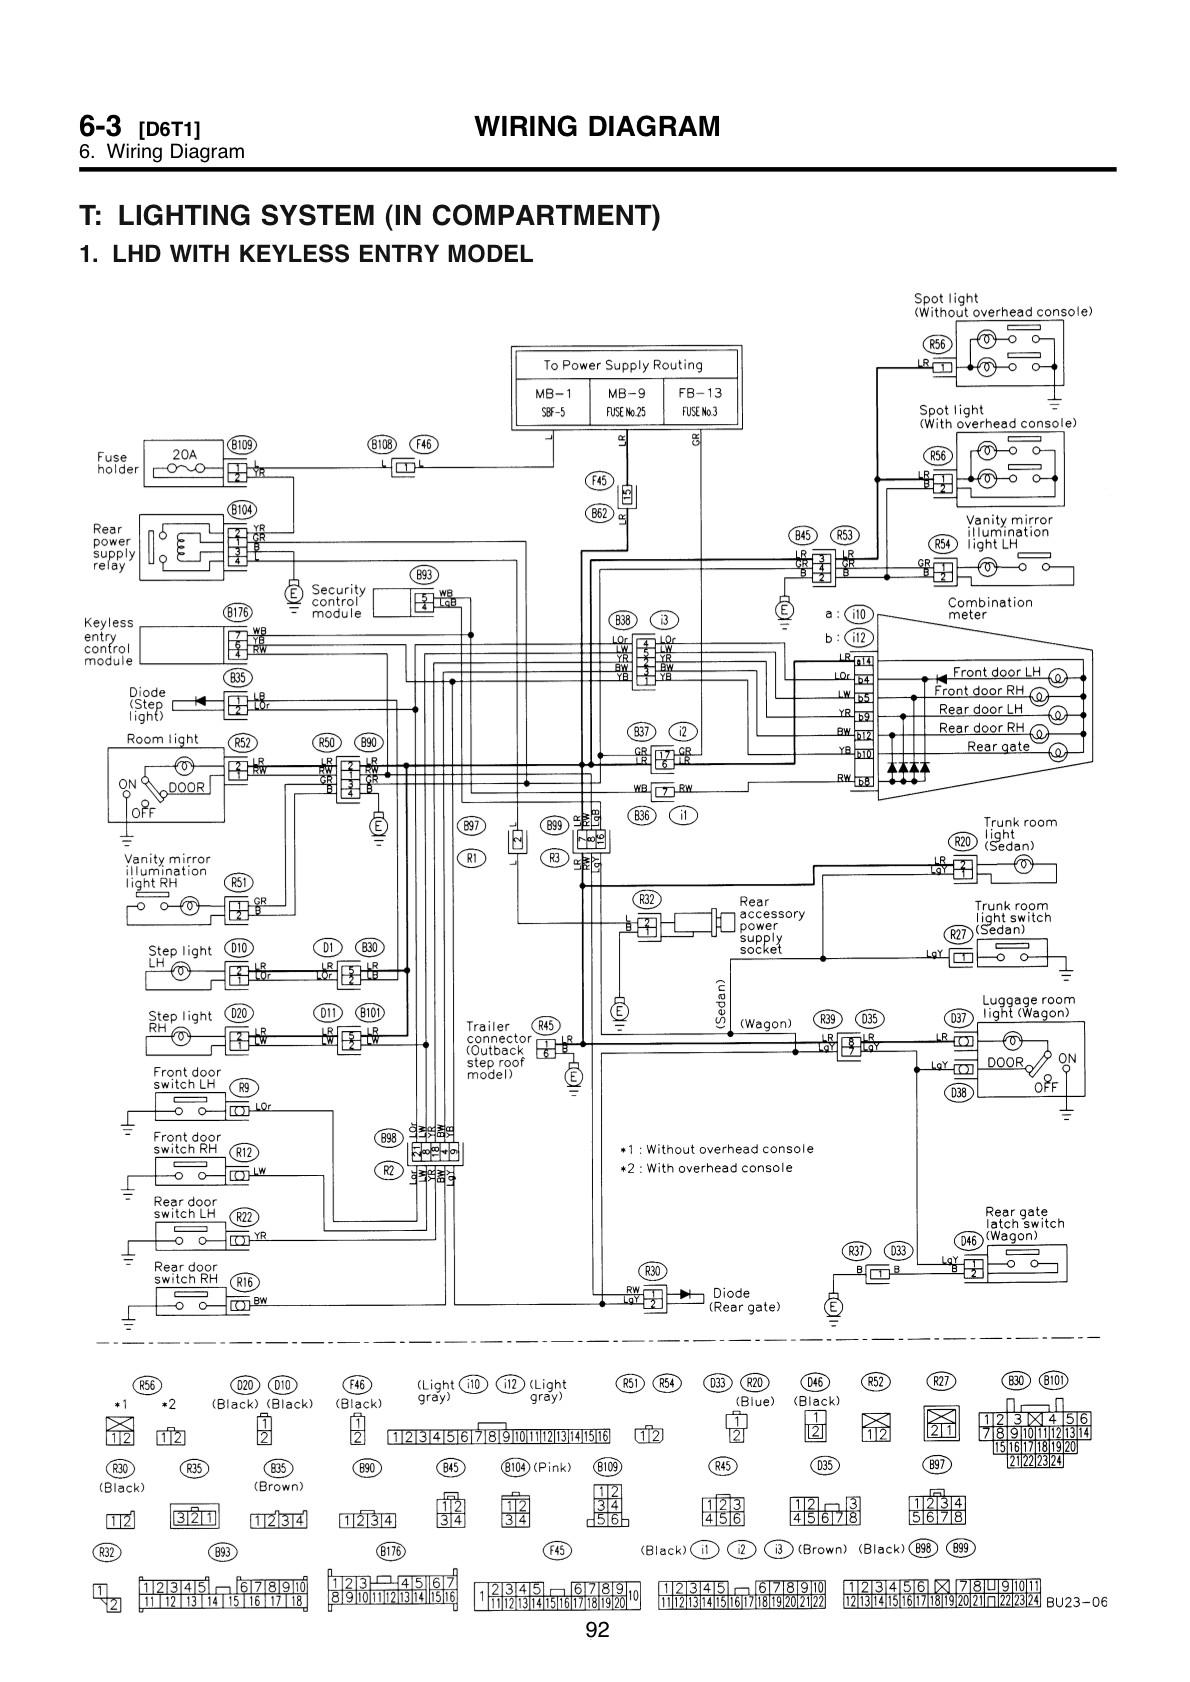 1997 Subaru Legacy Engine Diagram Wiring Diagram 2005 Subaru Legacy Stereo Block Bright Diagrams Of 1997 Subaru Legacy Engine Diagram